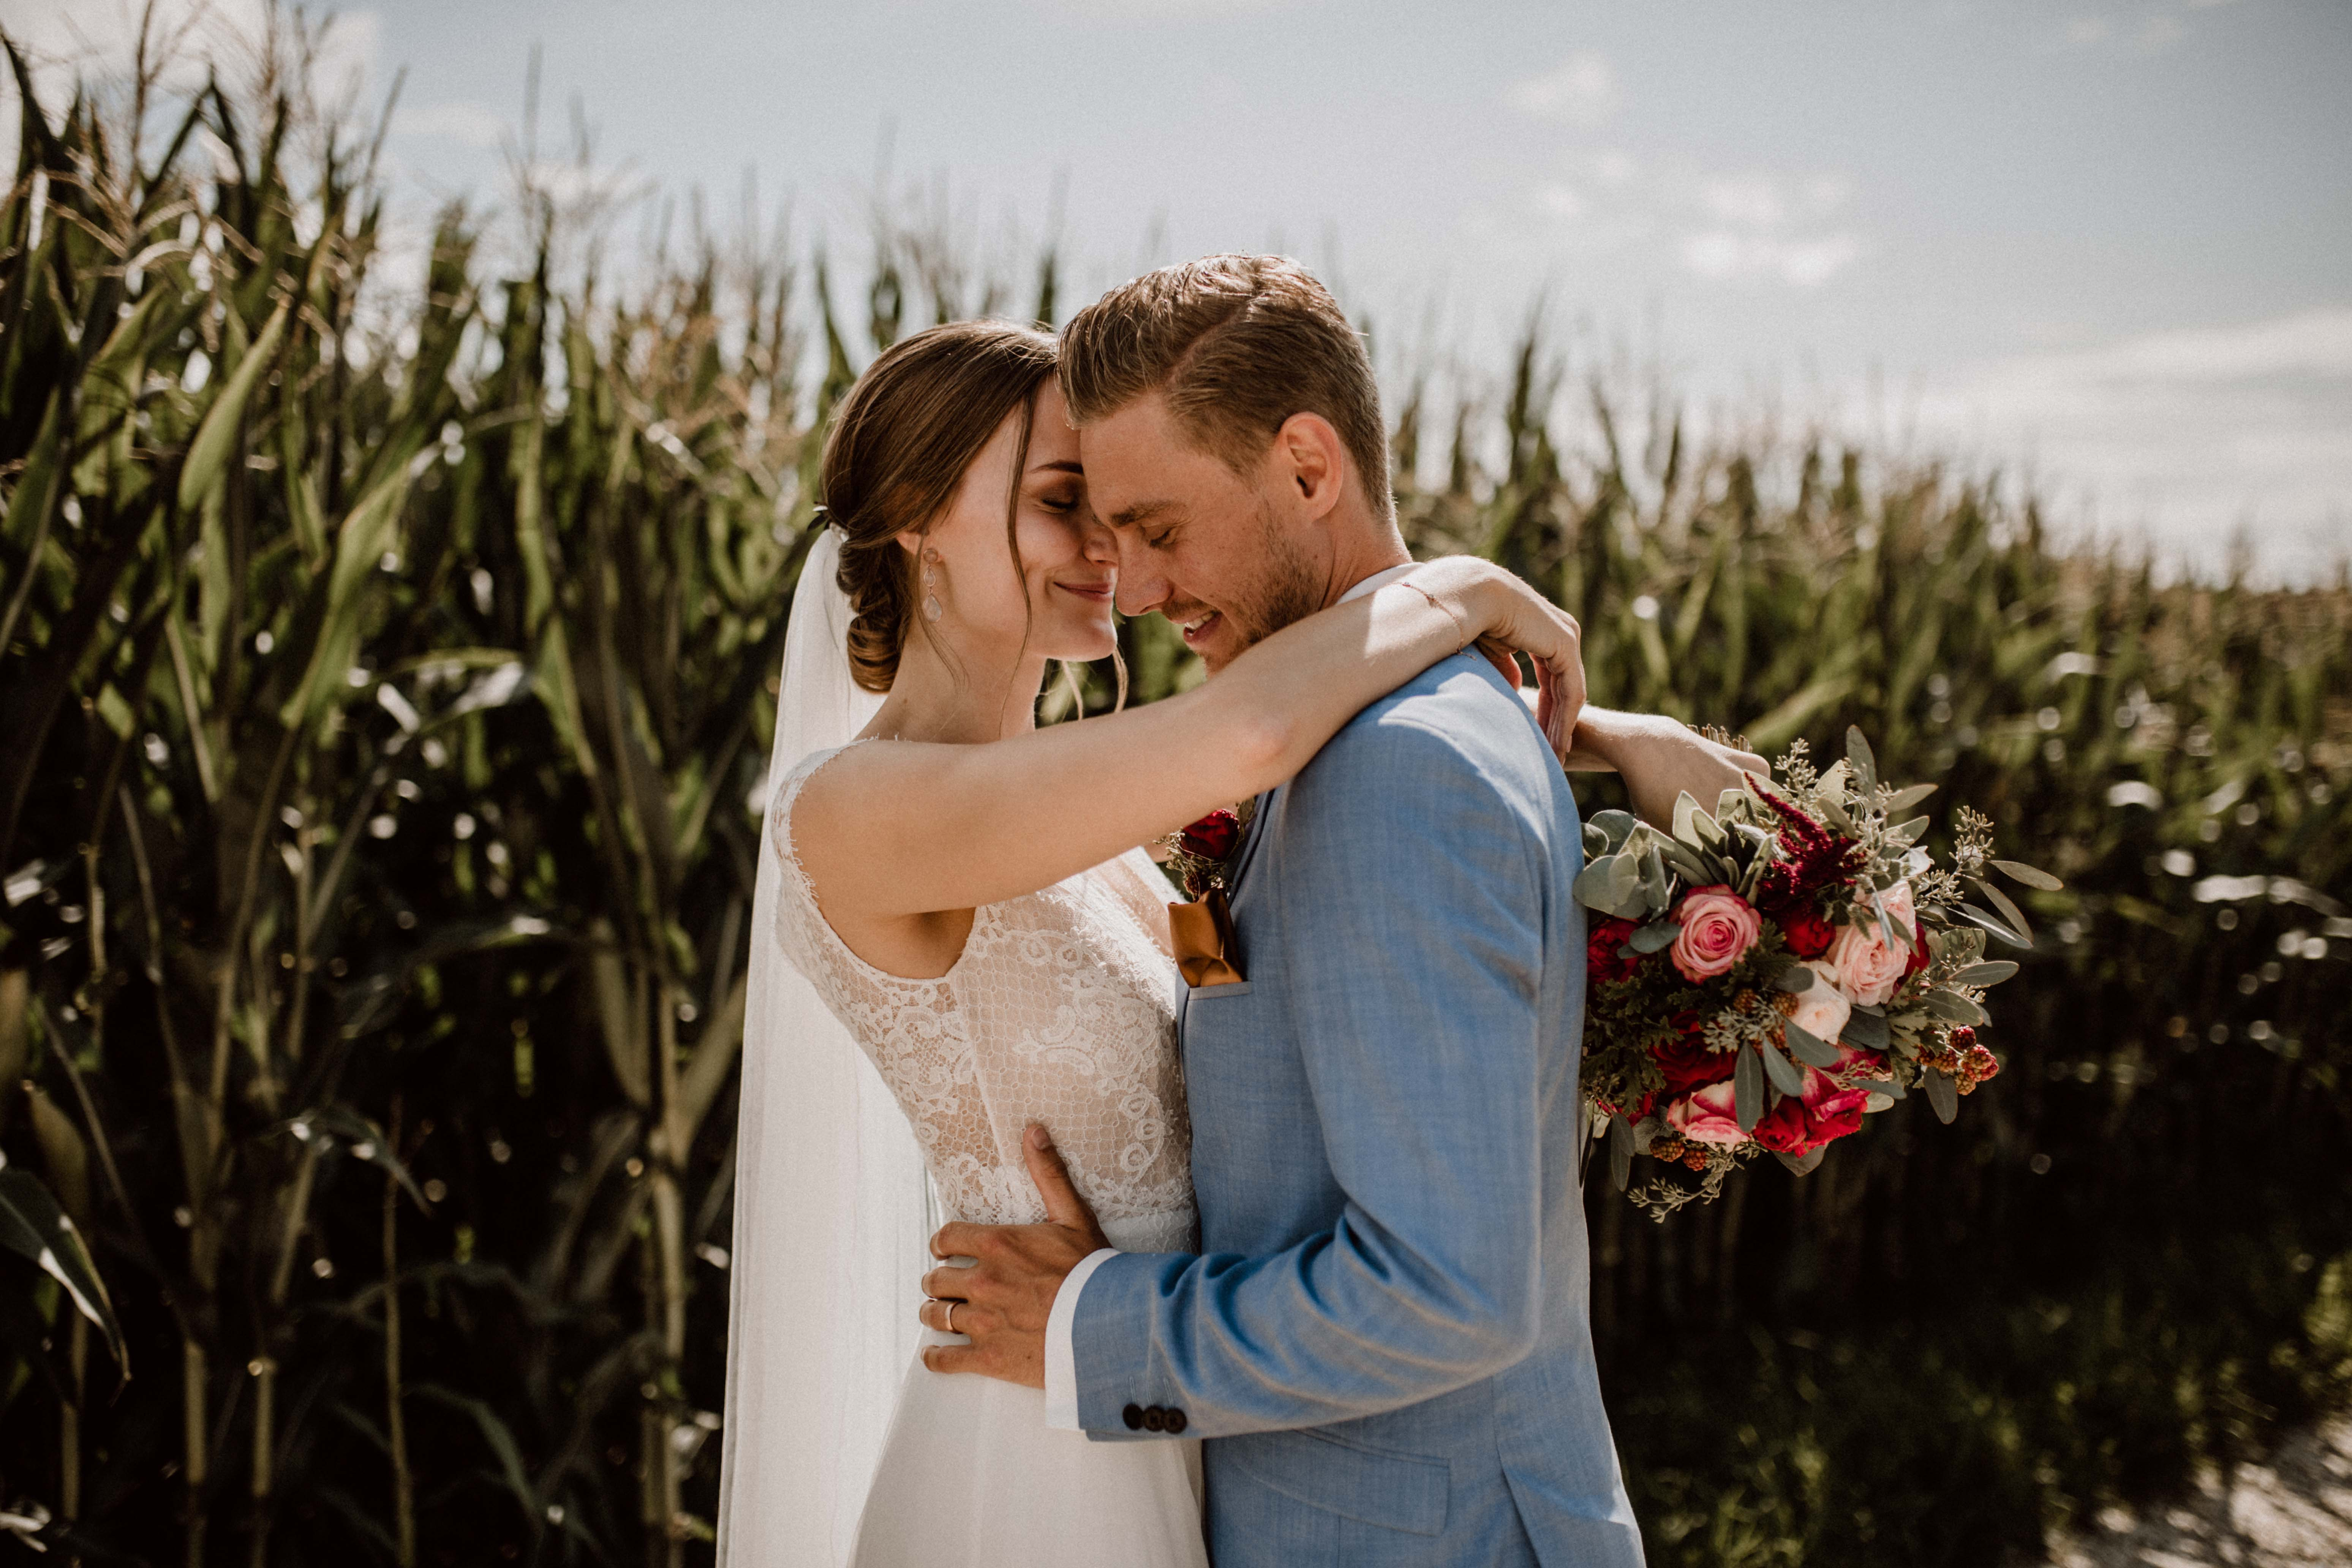 paar shoot sonja poehlmann photography couples muenchen bayern